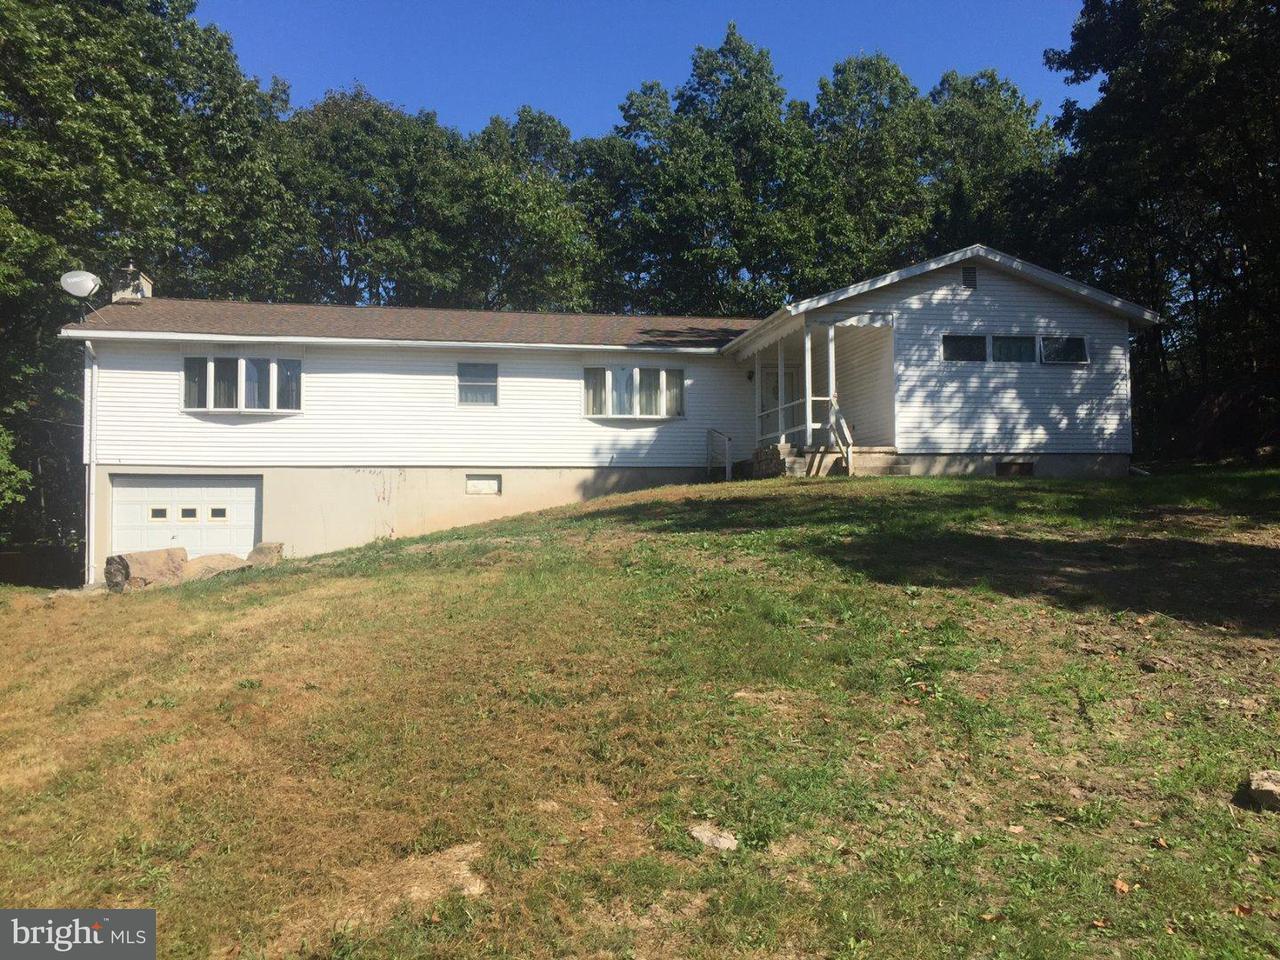 Single Family Home for Sale at 145 N WYLAM Street Frackville, Pennsylvania 17931 United States